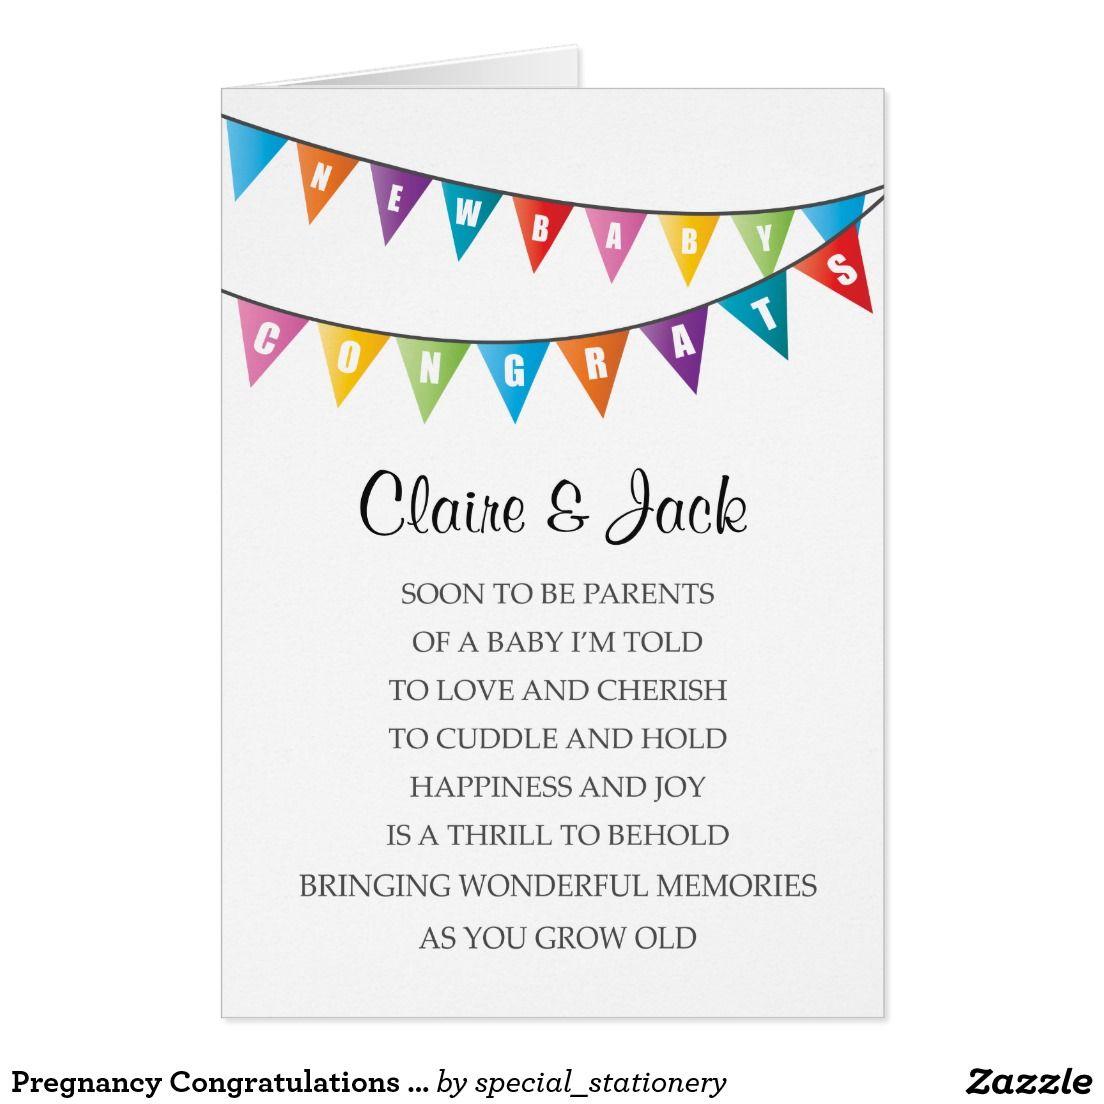 Pregnancy Congratulations New Baby Bright Poem Card Baby